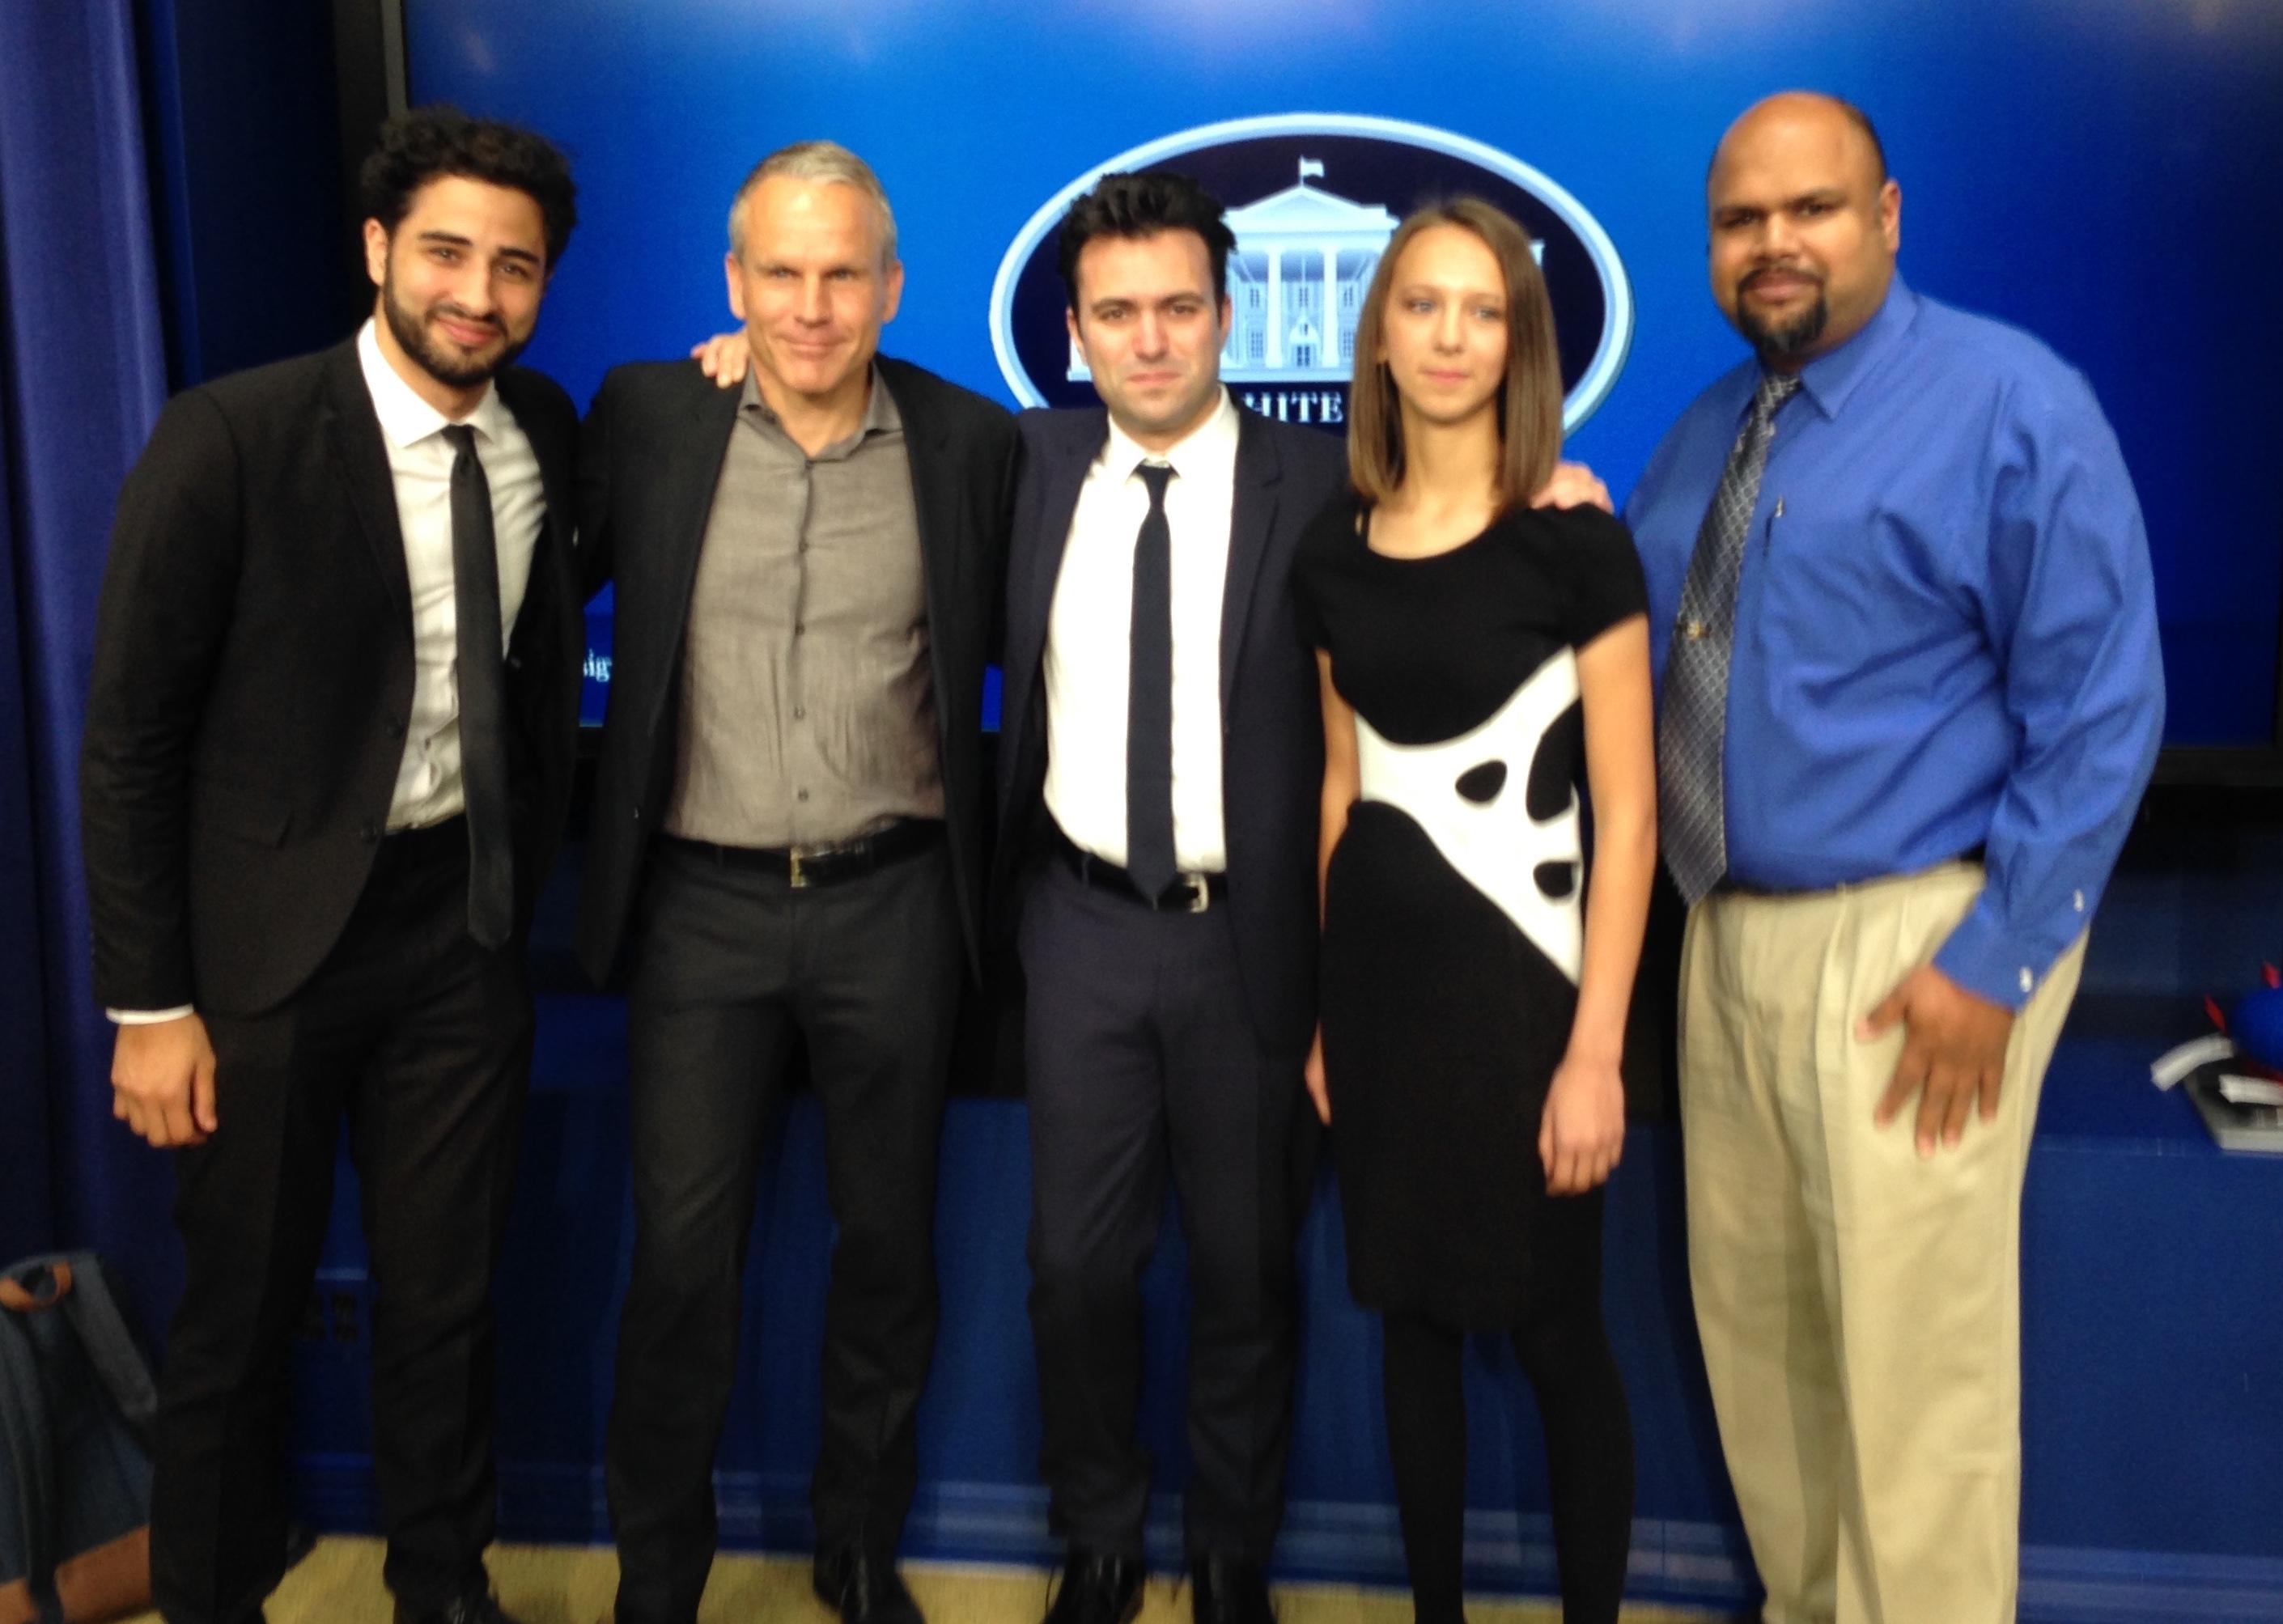 (L-R) Peter Wildfeuer, Eythor Bender, designer Francis Bitonti, Grace Mosier wearing UNYQ Align™ scoliosis brace, and Shashi Jain. (Photo: UNYQ)